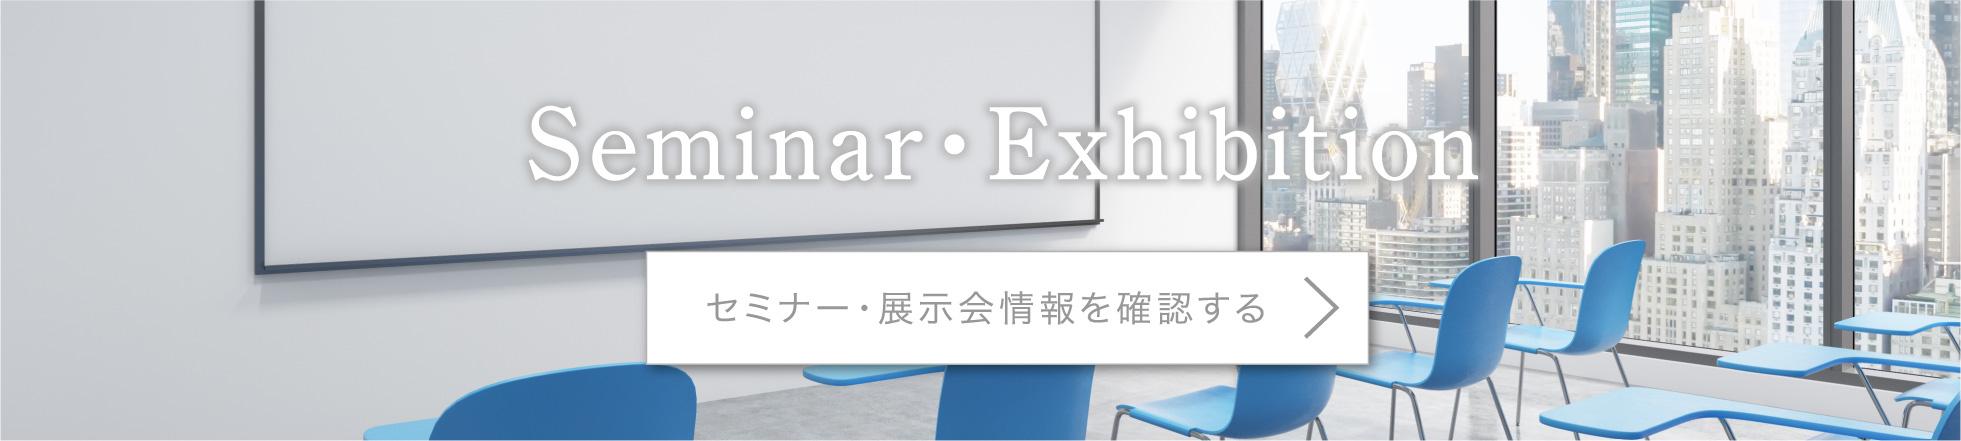 Seminar・Exhibition セミナー・展示会情報を確認する